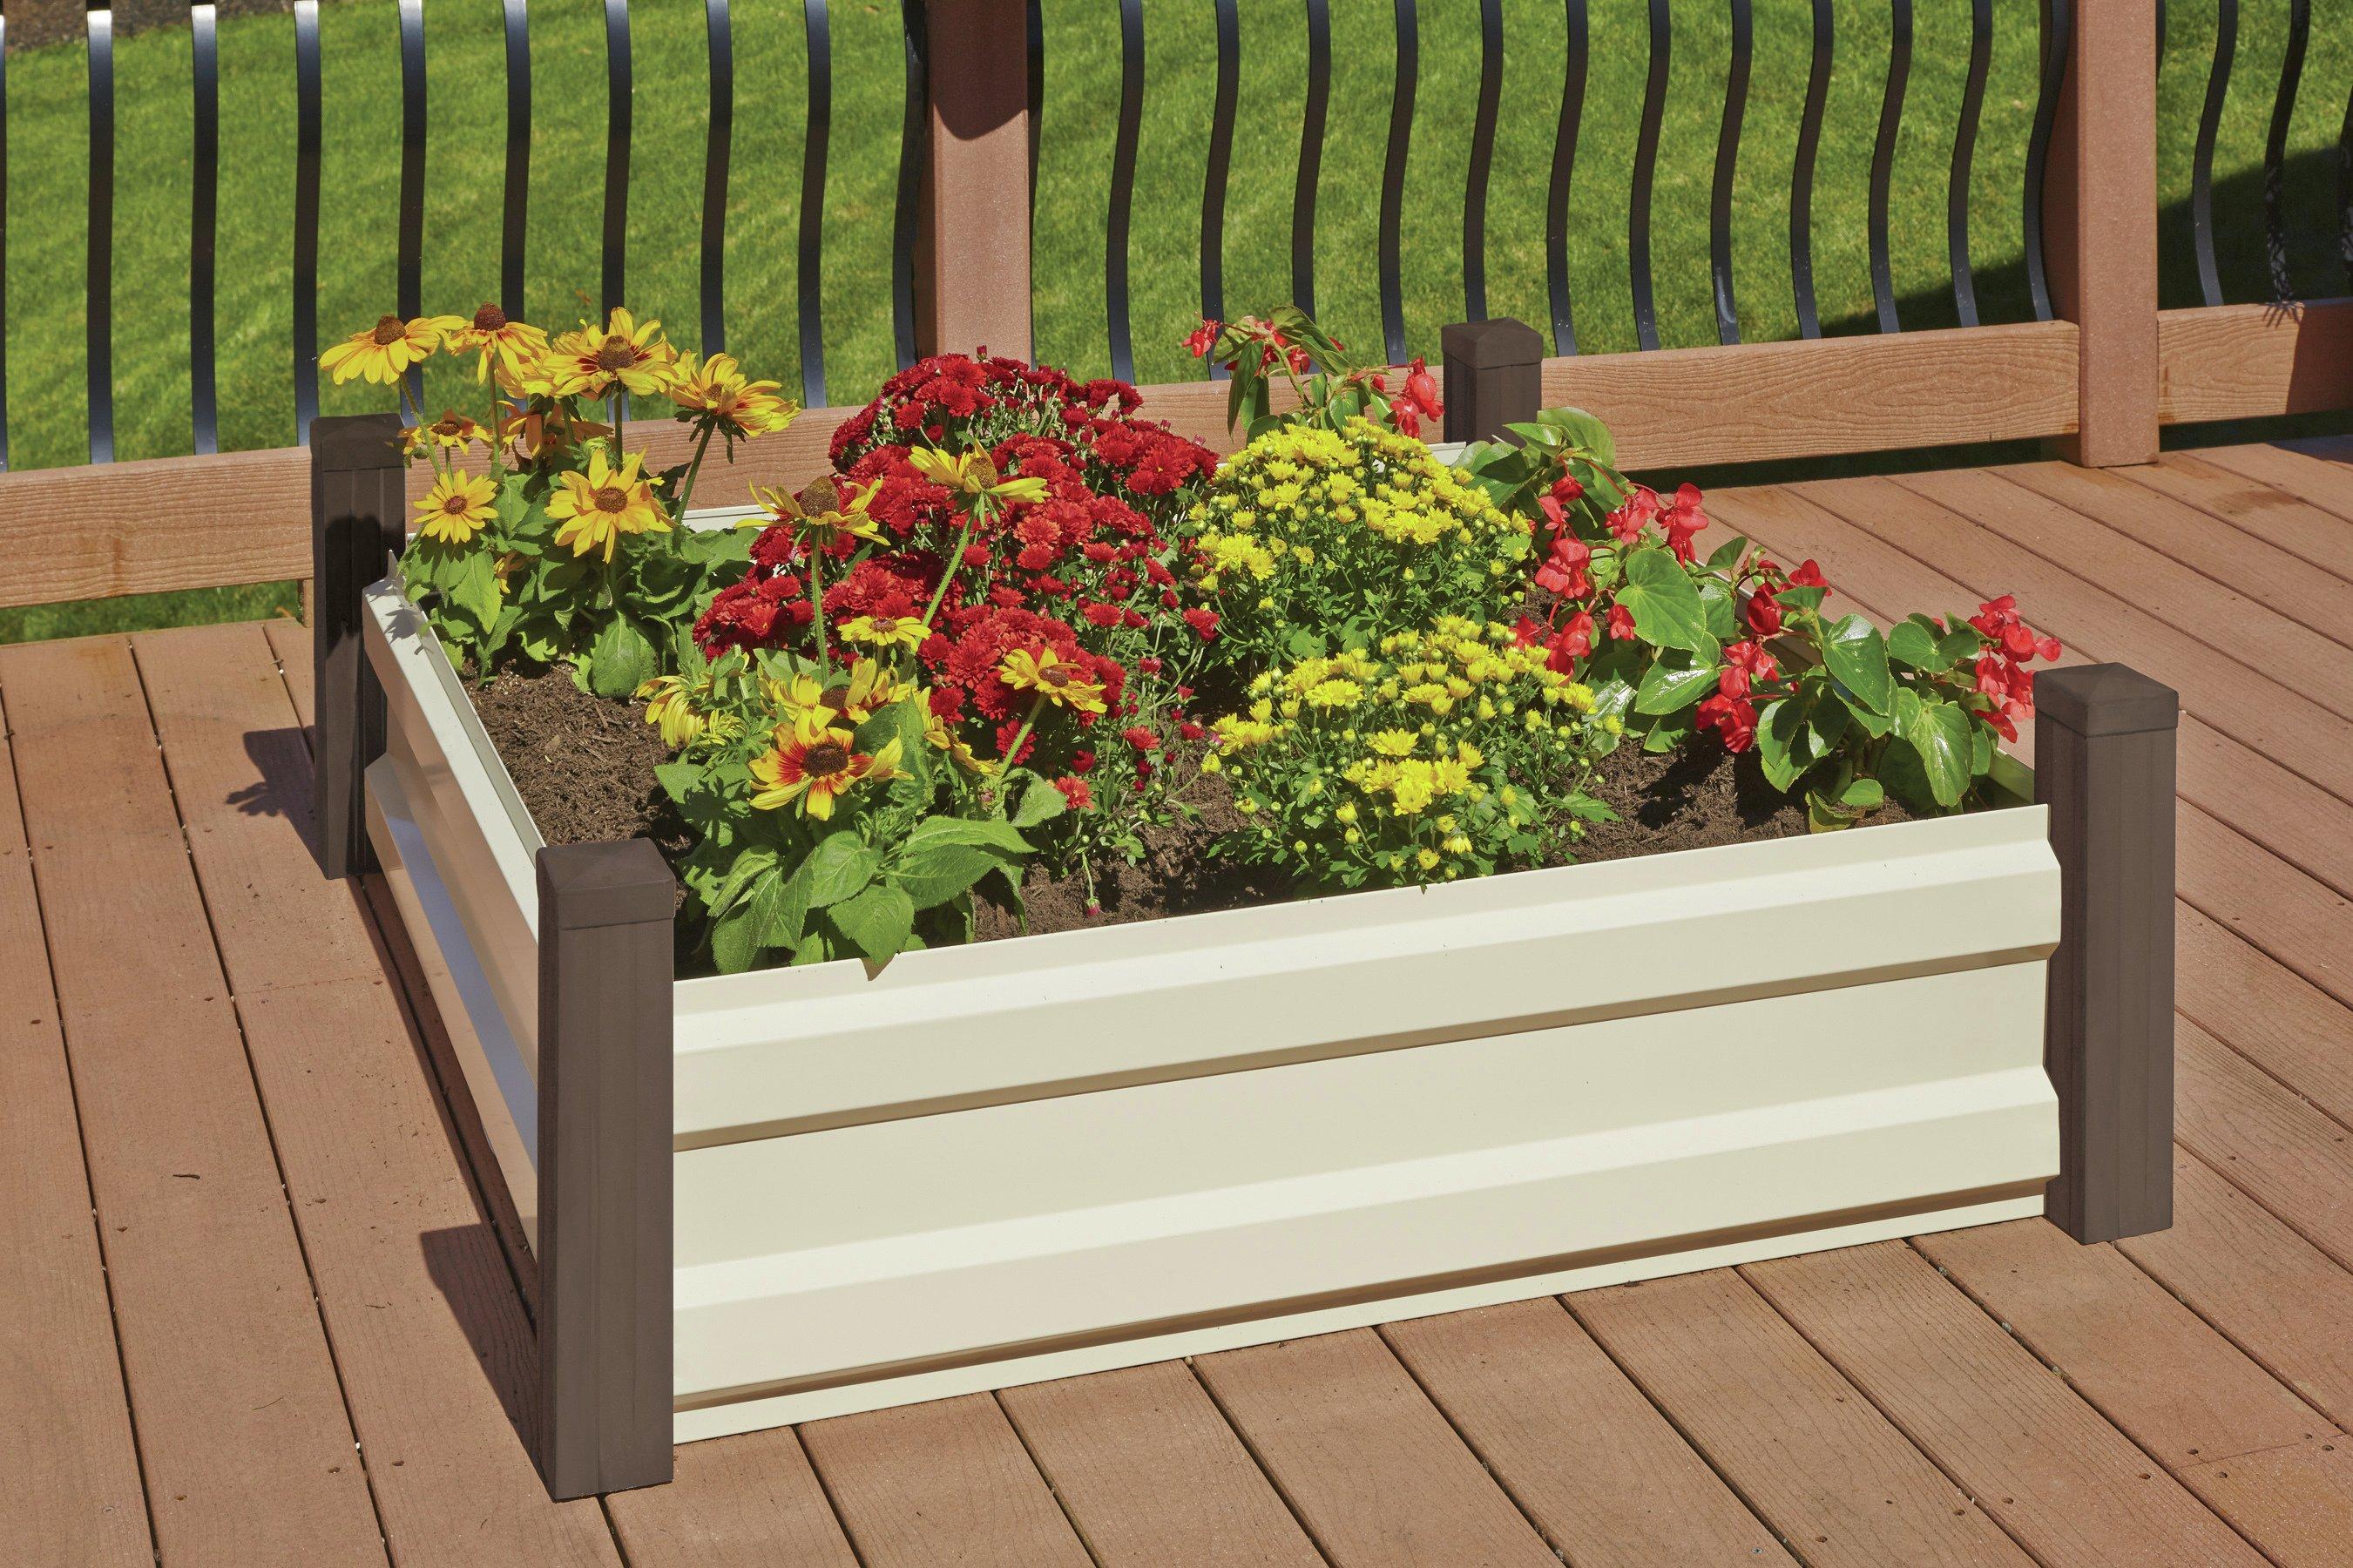 4x4 Metal Raised Bed Garden. lowest price